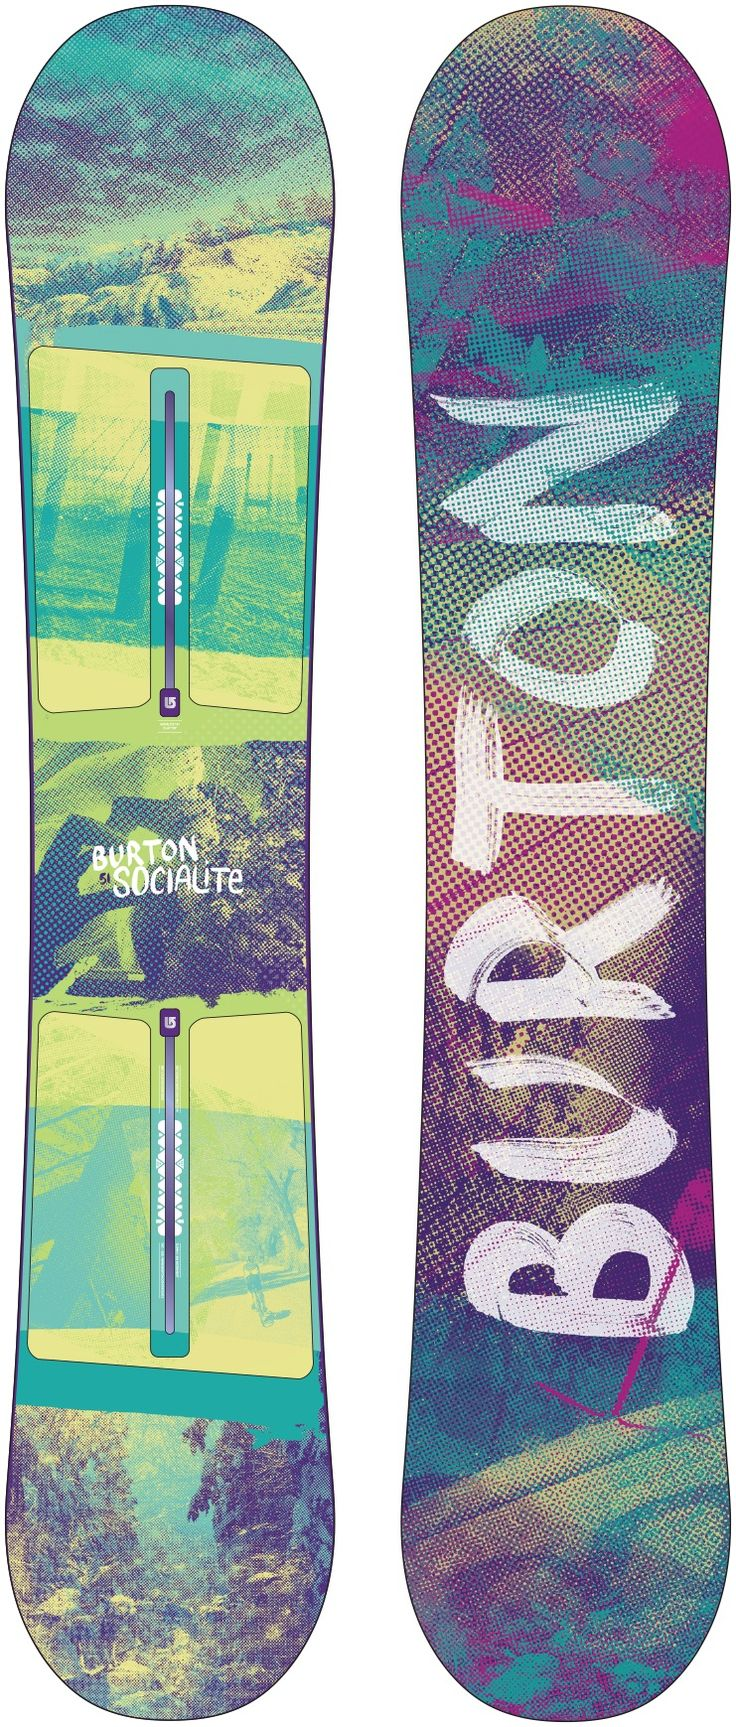 Burton Women's Socialite 15 Snowboard -Womens Snowboards -Alpine Shop